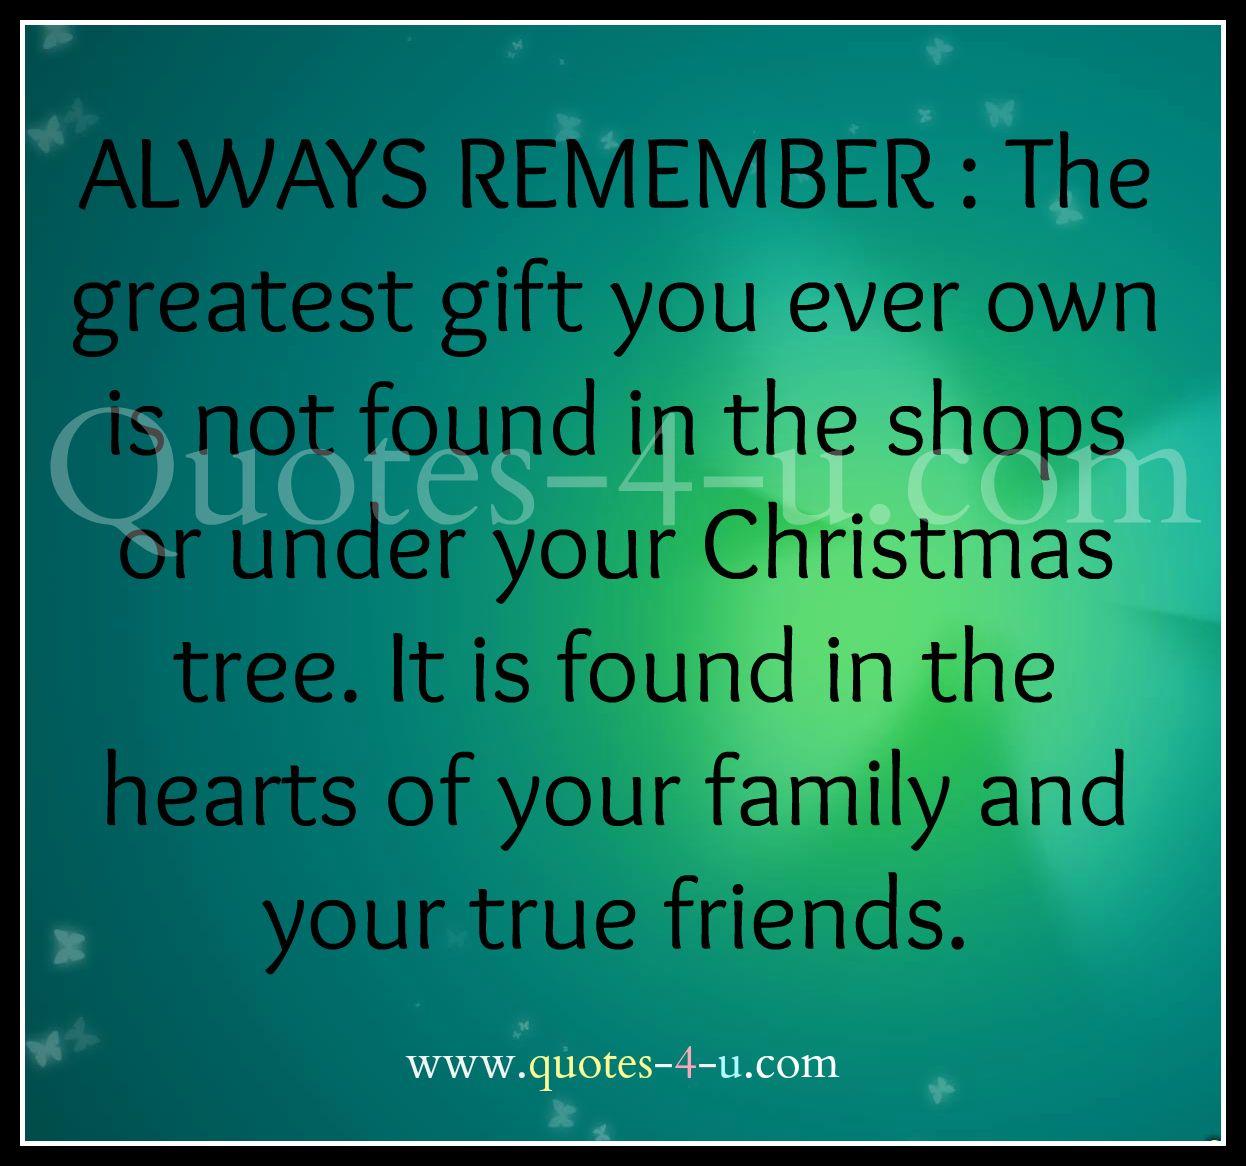 family friends inspira...